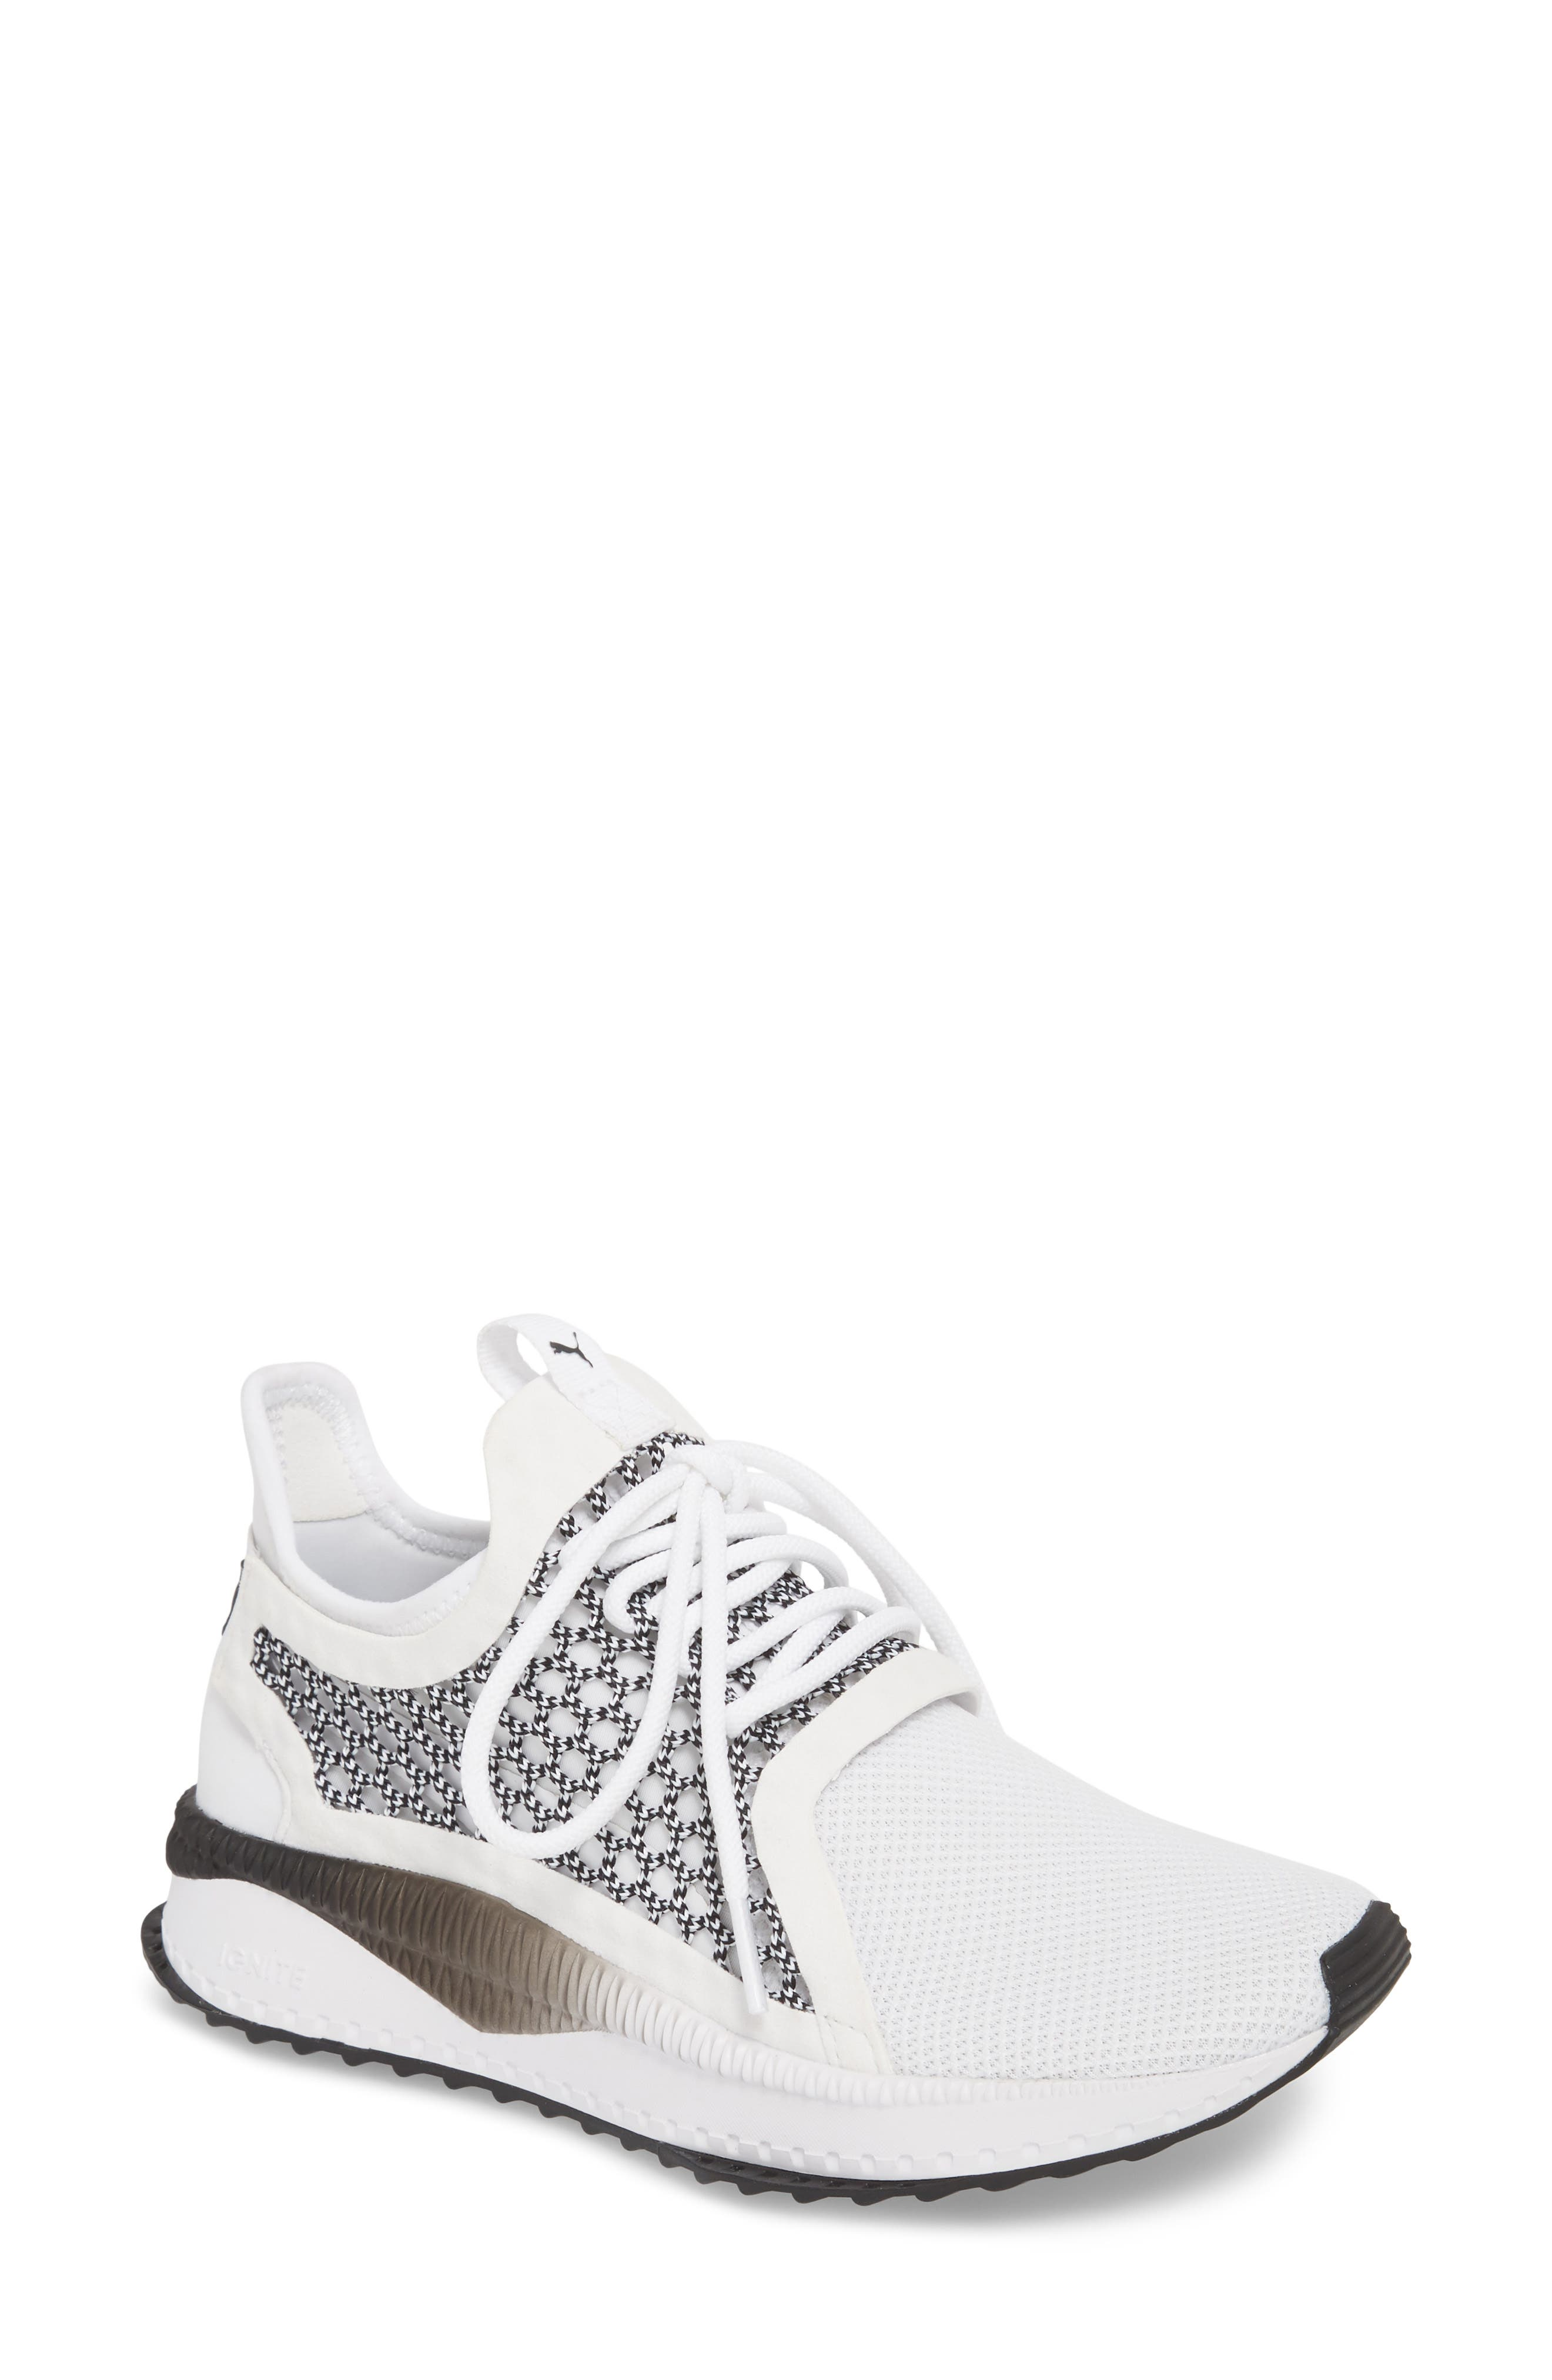 Tsugi Netfit evoKNIT Training Shoe,                         Main,                         color,